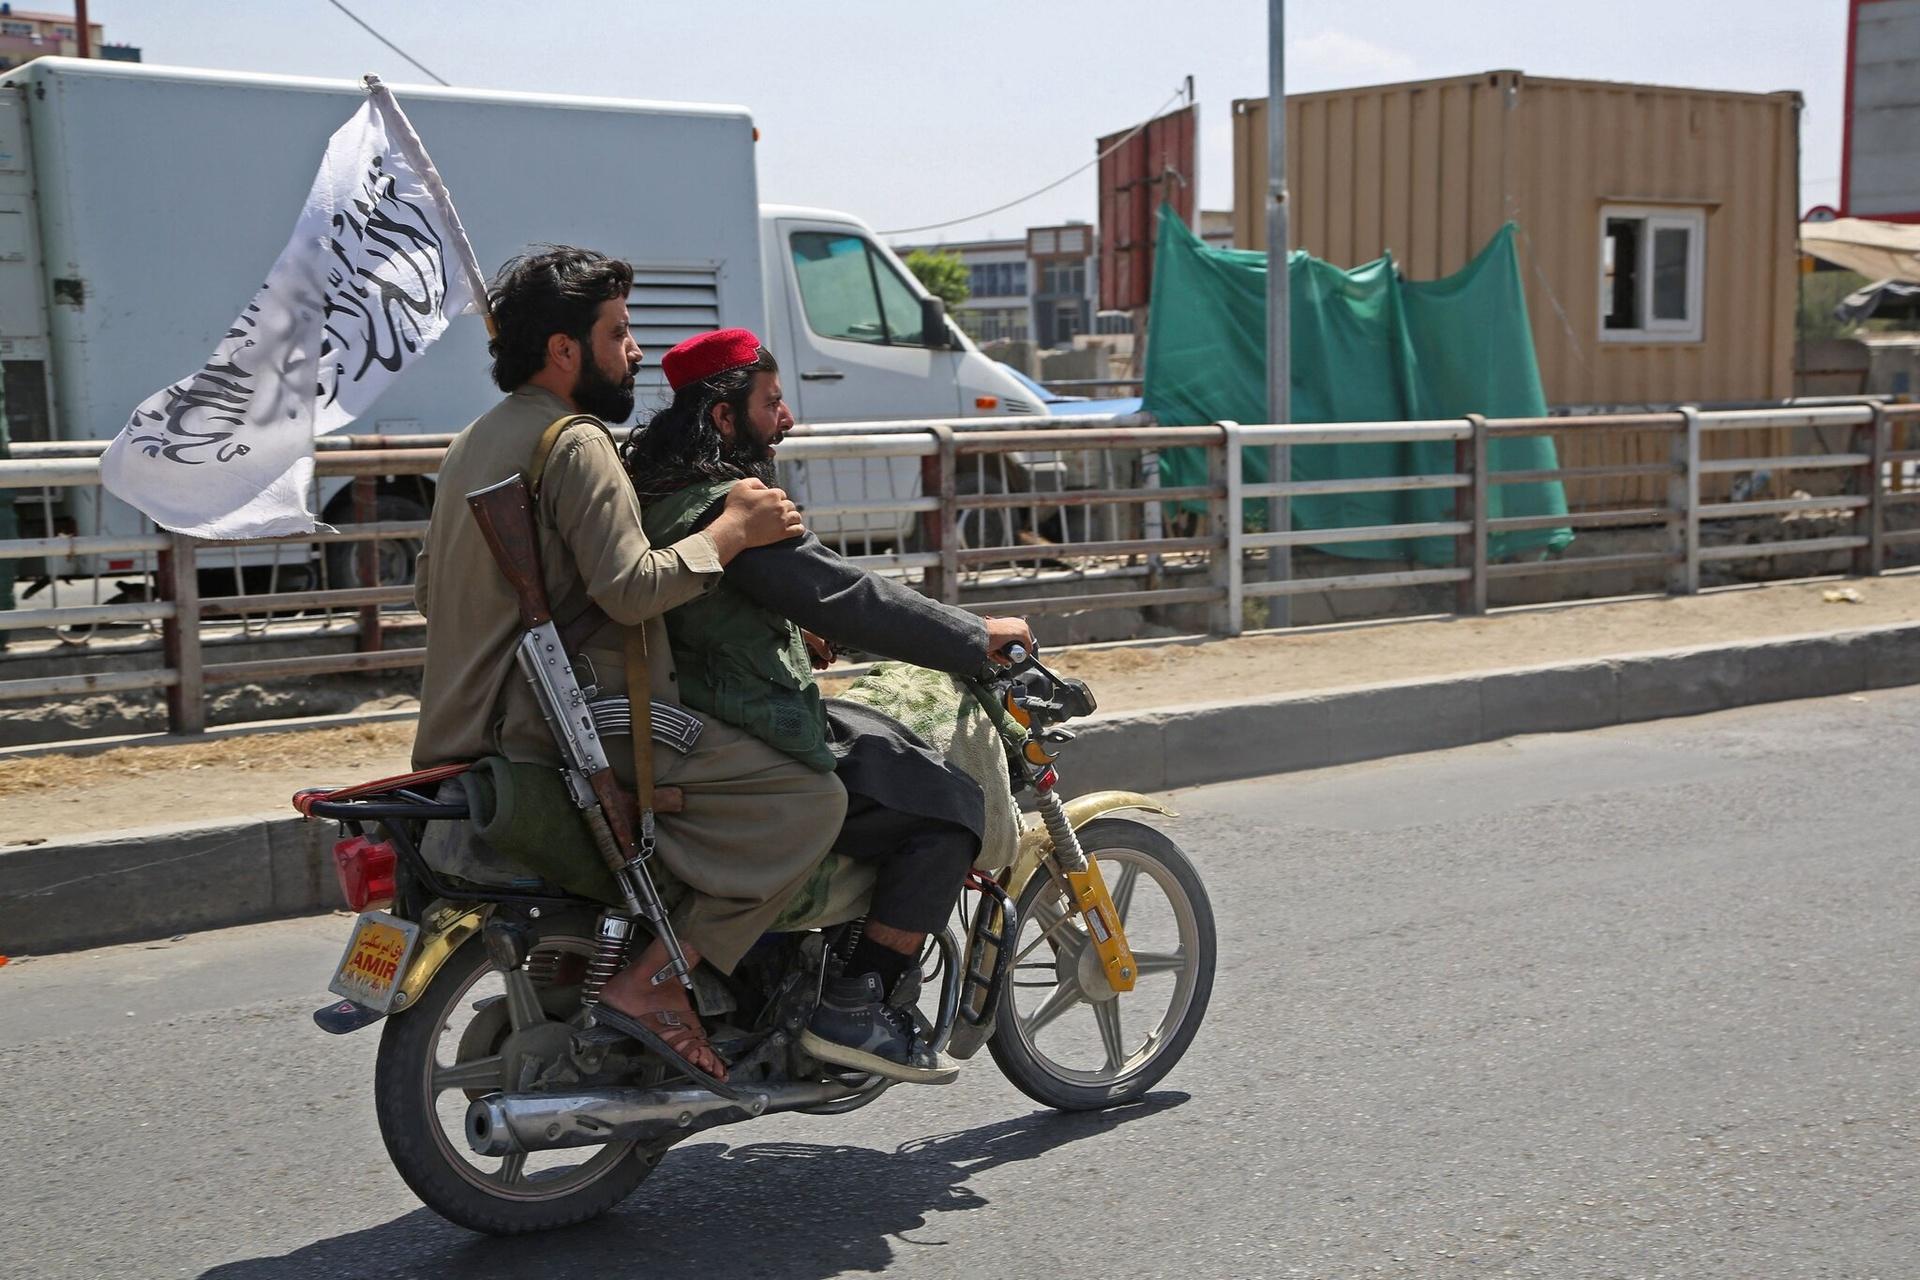 tinh hinh Afghanistan anh 3